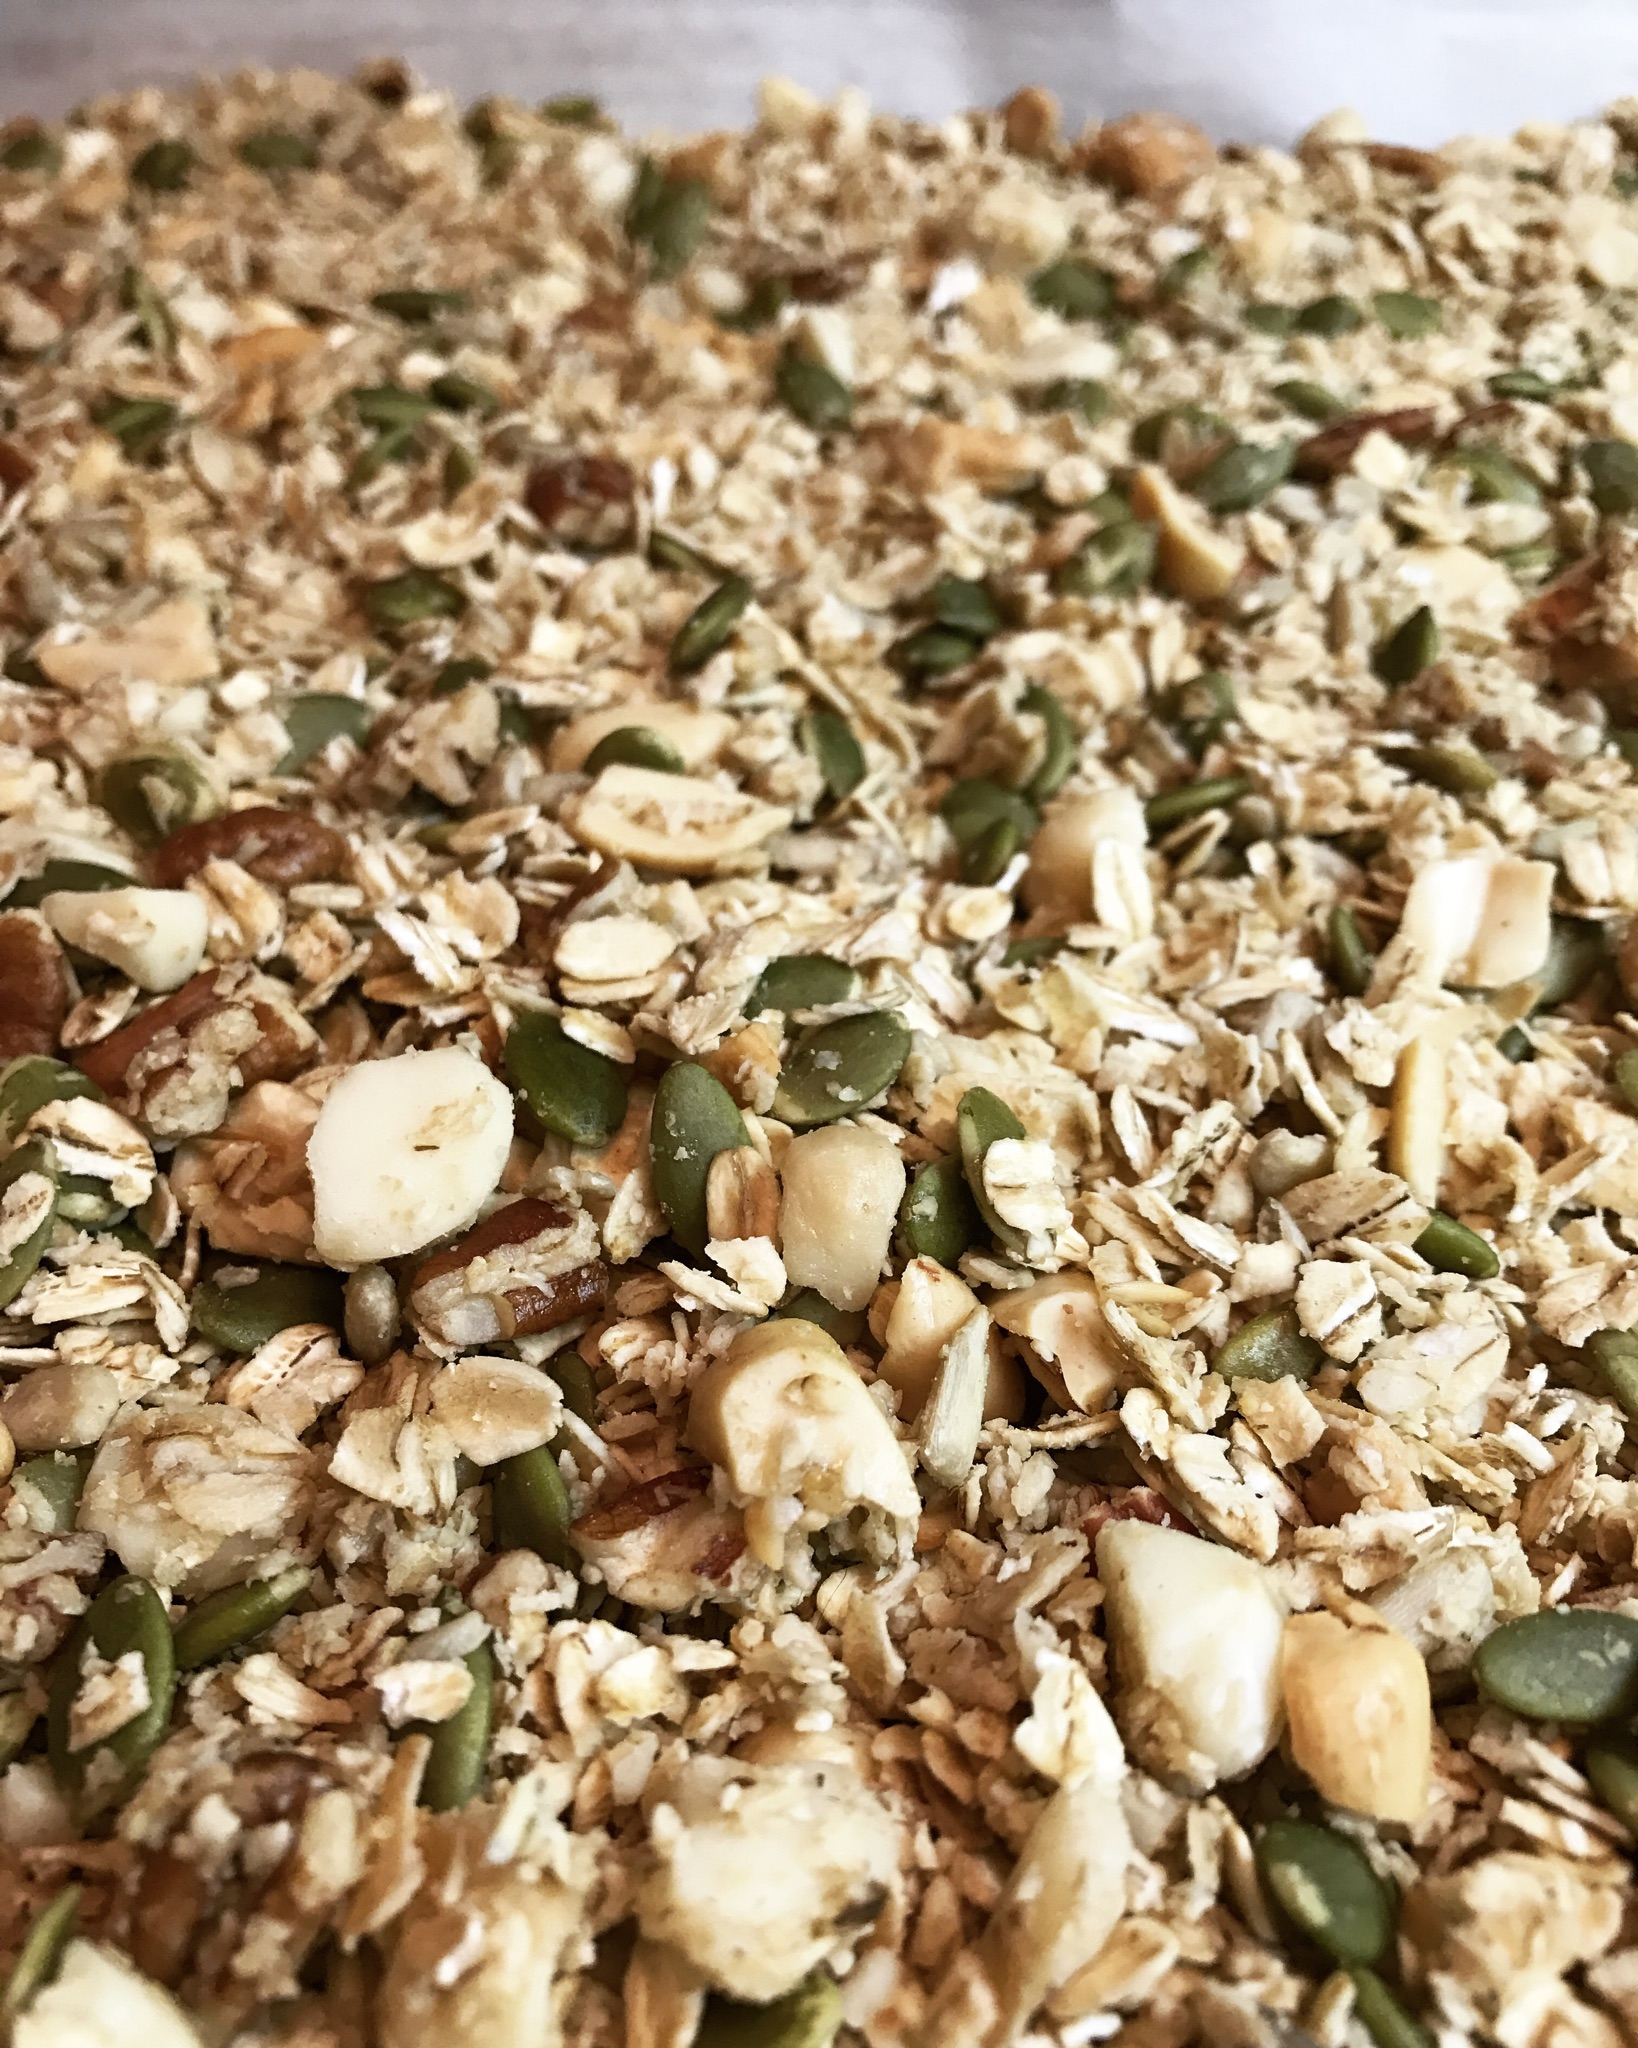 HOT TIP: Granola smells like burnt popcorn is overcooked. So I've heard ;)